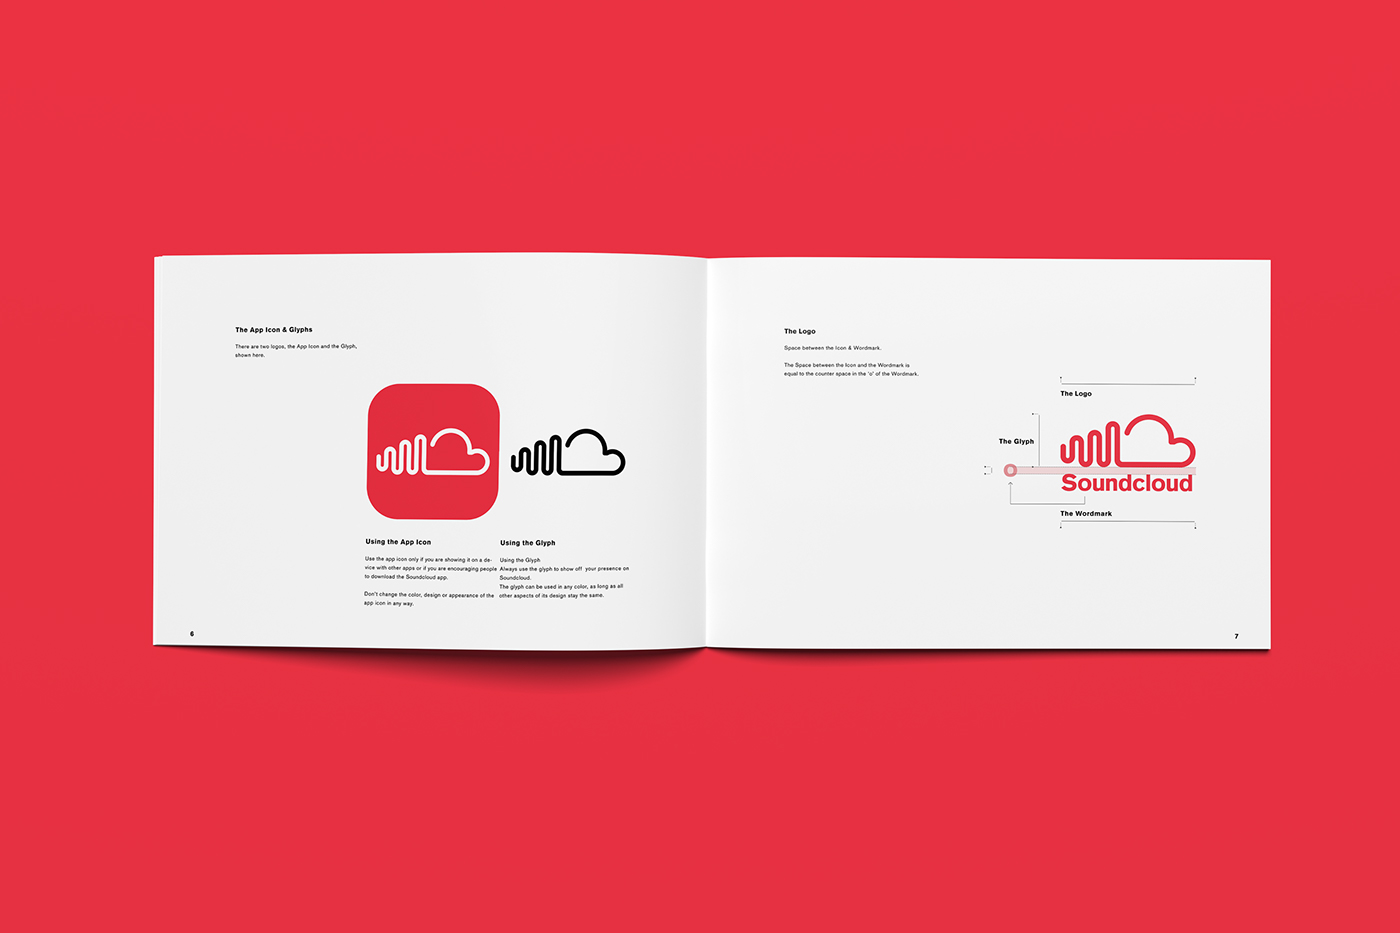 Soundcloud Brand Guidelines - Rebrand on Behance